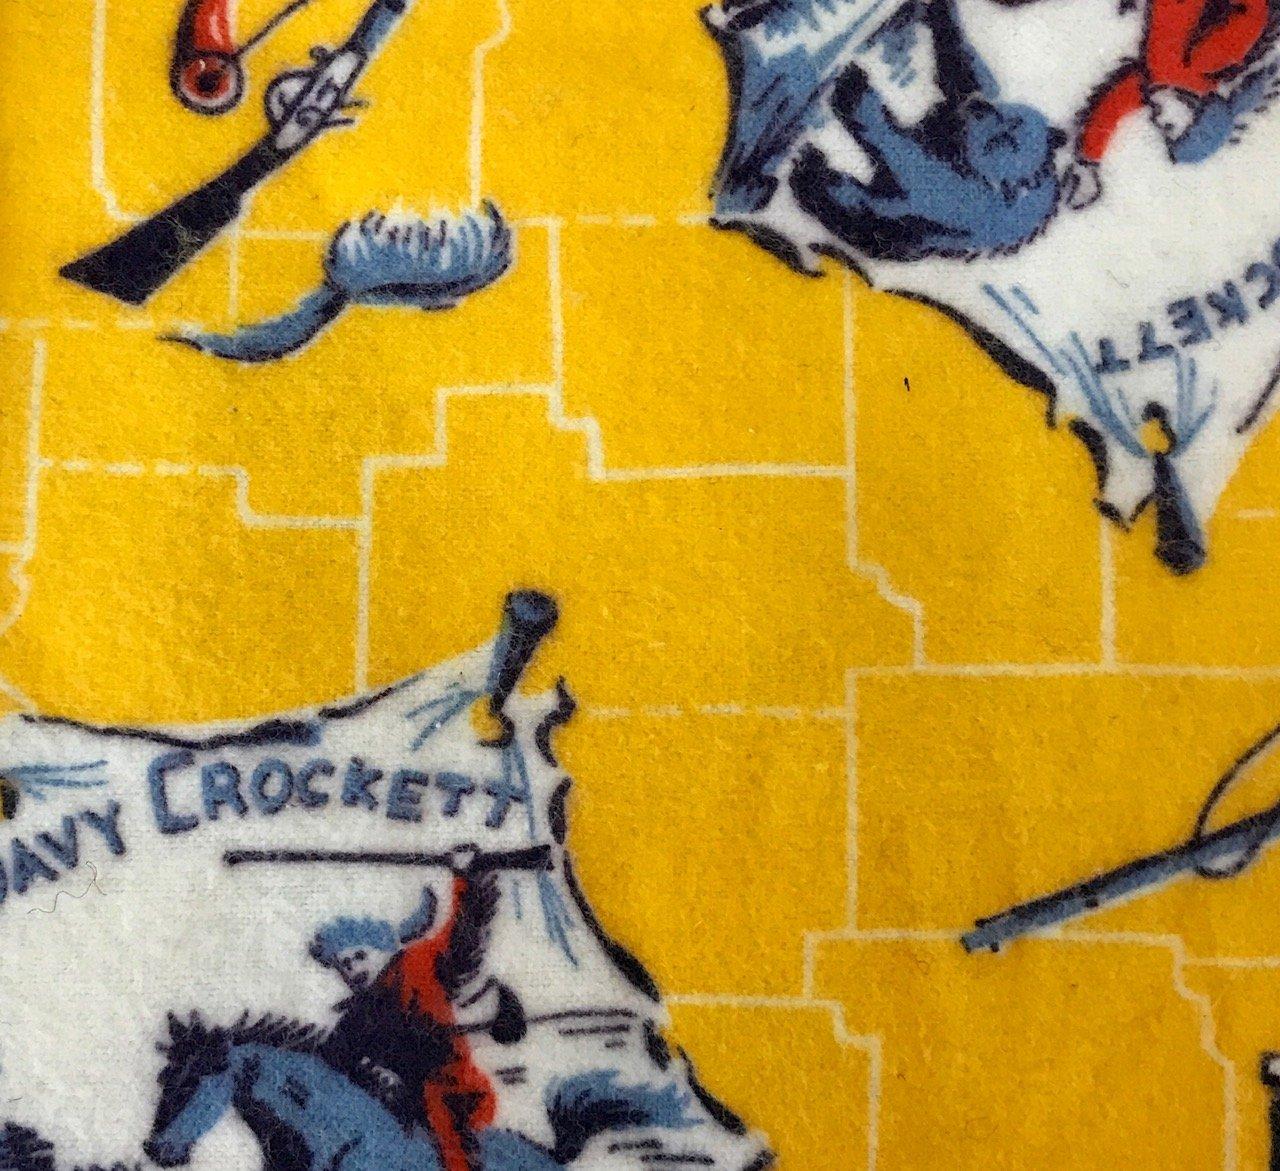 100% Cotton Flannel - Davey Crocket Fishing